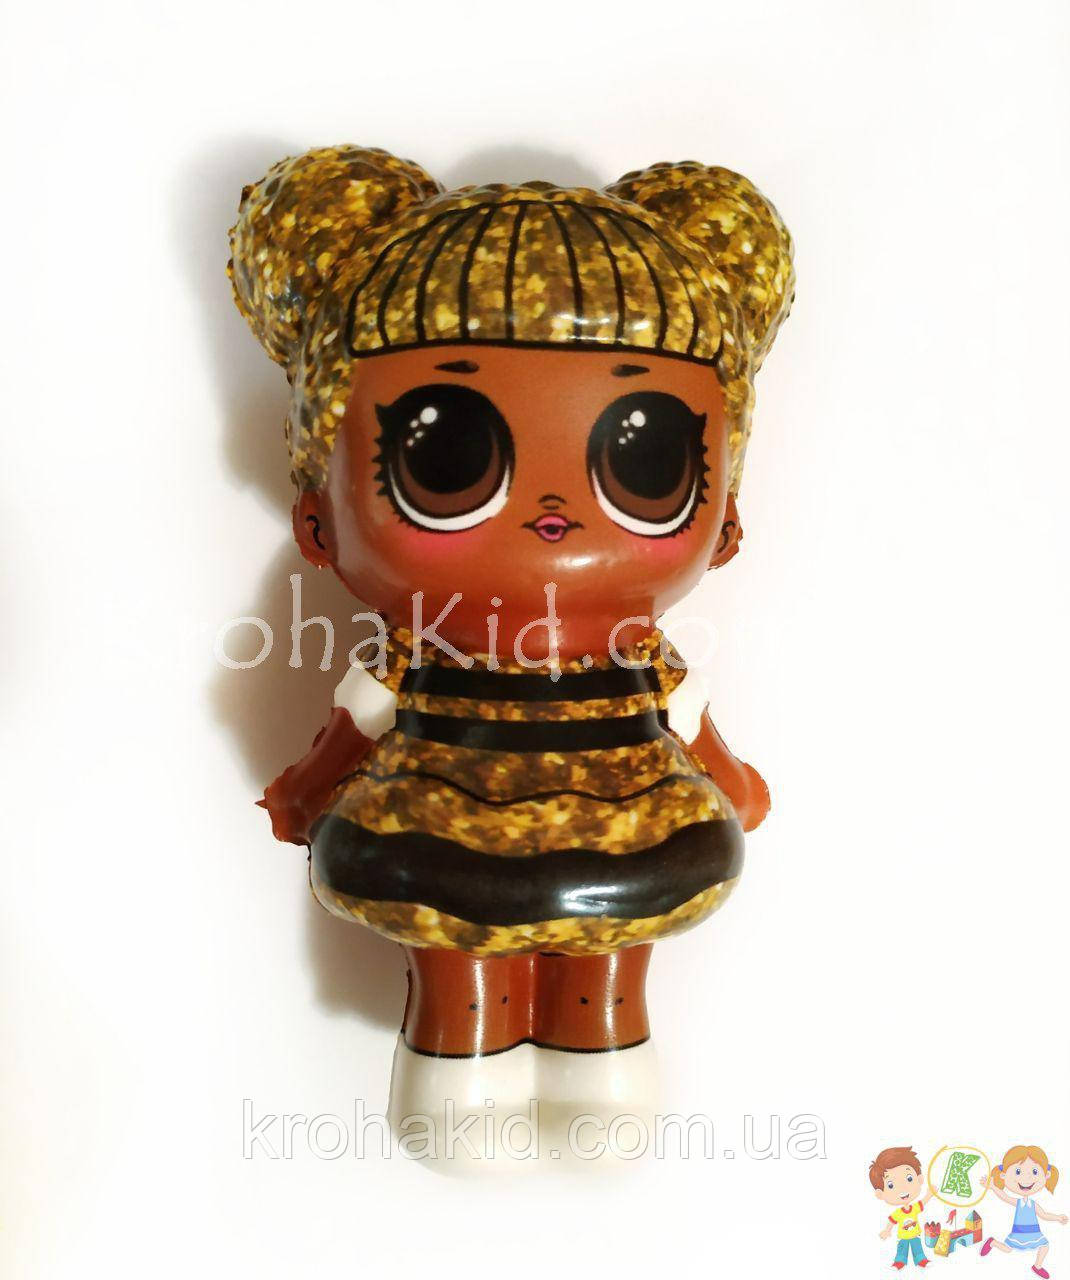 Сквиш куколка Лол глиттер - 13 см / LOl Doll squishy / Сквуши / Игрушка-антистересс